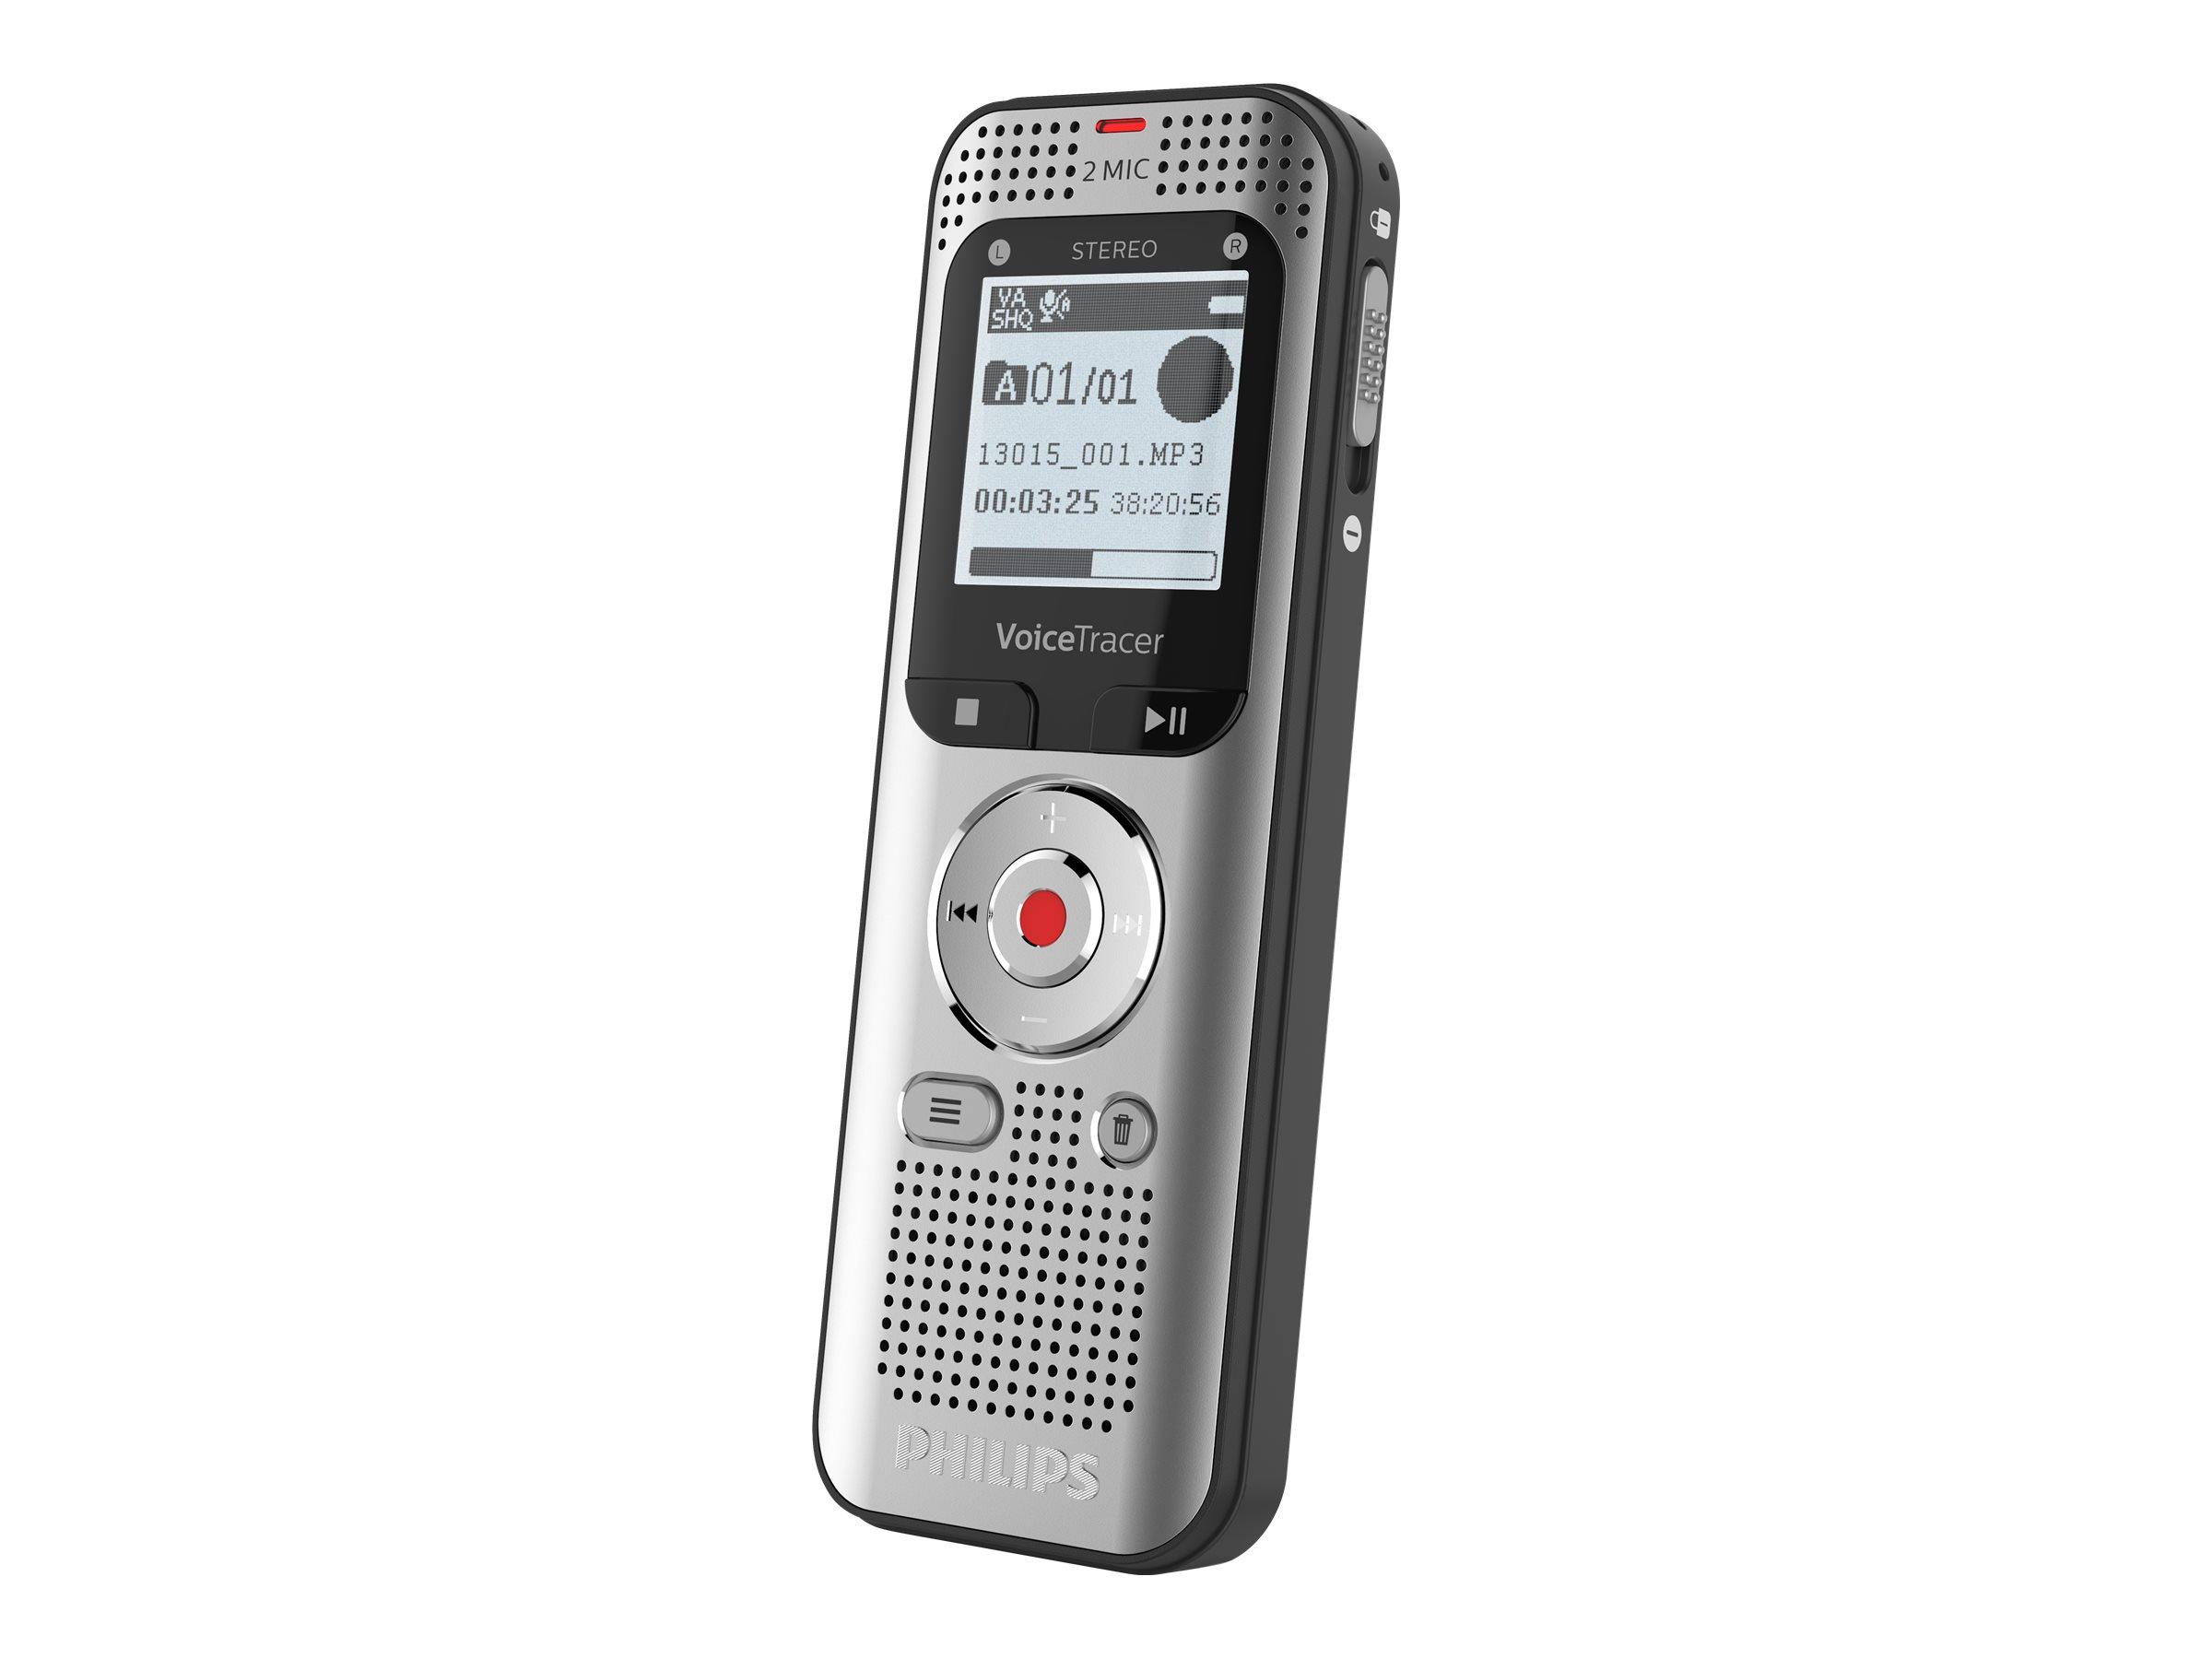 Philips Voice Tracer DVT2050 - Voicerecorder - 8 GB - Aluminium Light Silver Metal Front und Black